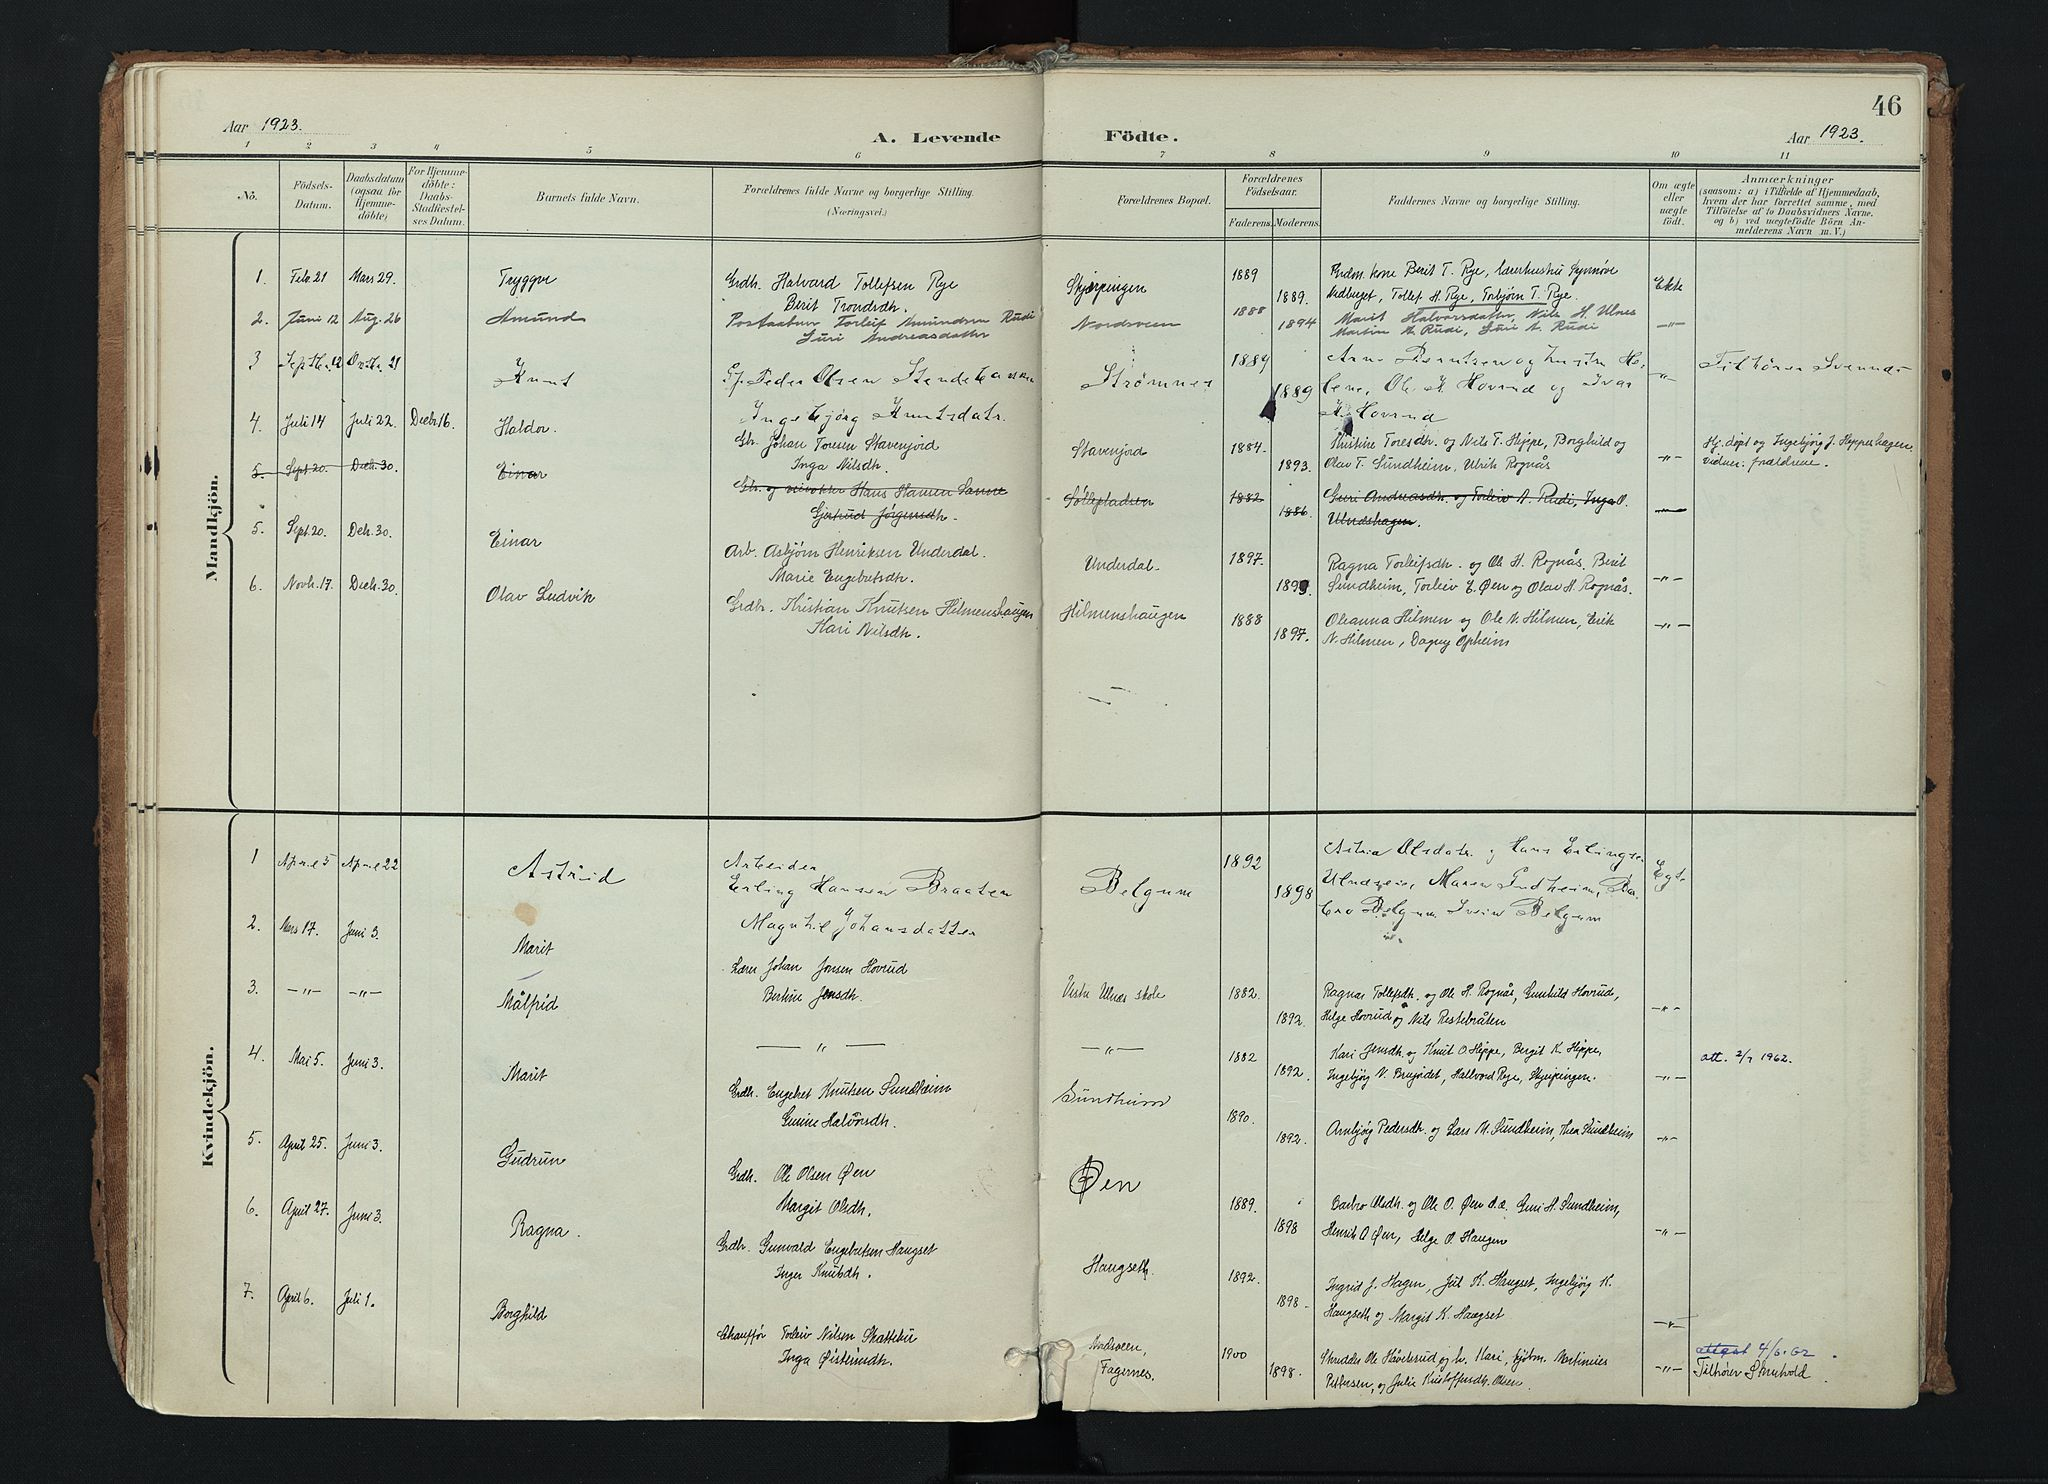 SAH, Nord-Aurdal prestekontor, Ministerialbok nr. 17, 1897-1926, s. 46